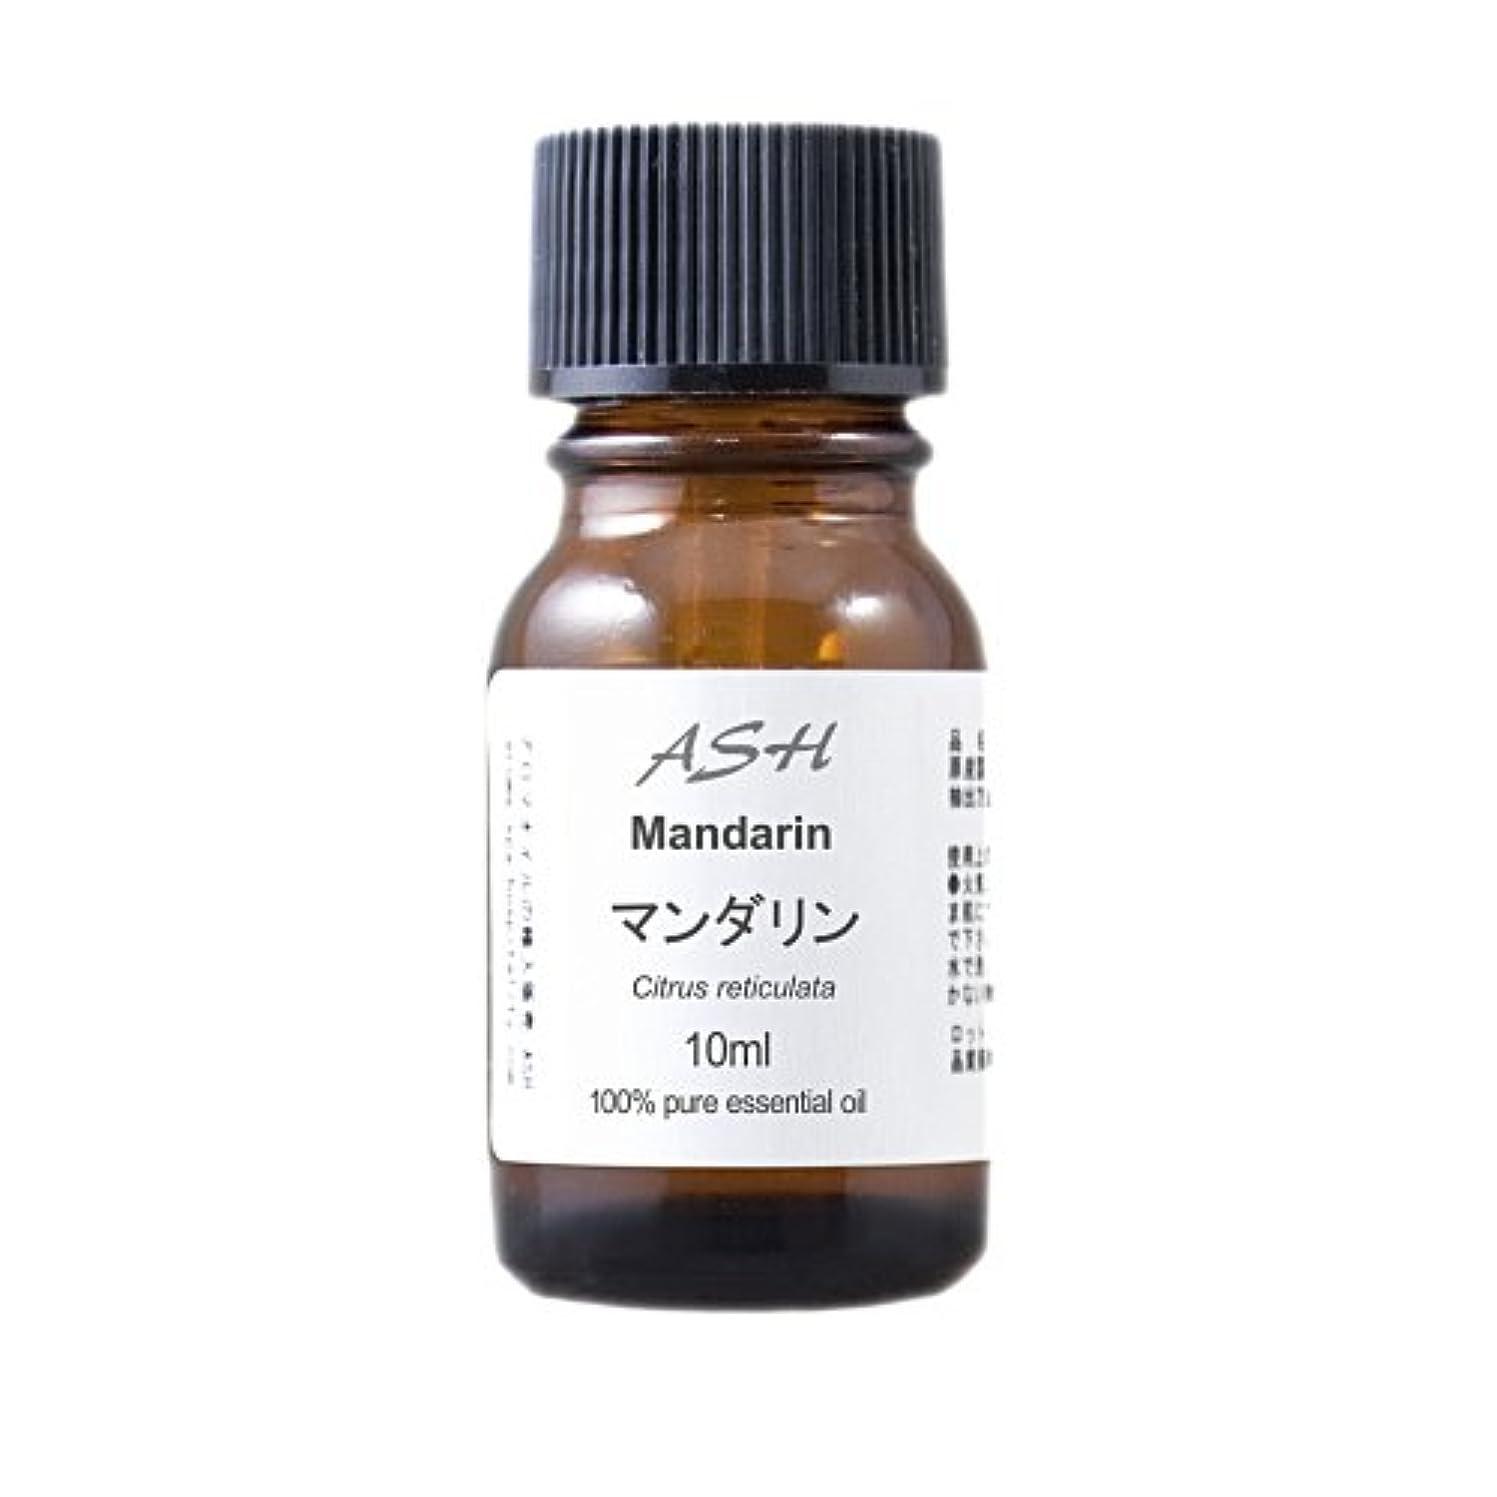 ASH マンダリン エッセンシャルオイル 10ml AEAJ表示基準適合認定精油